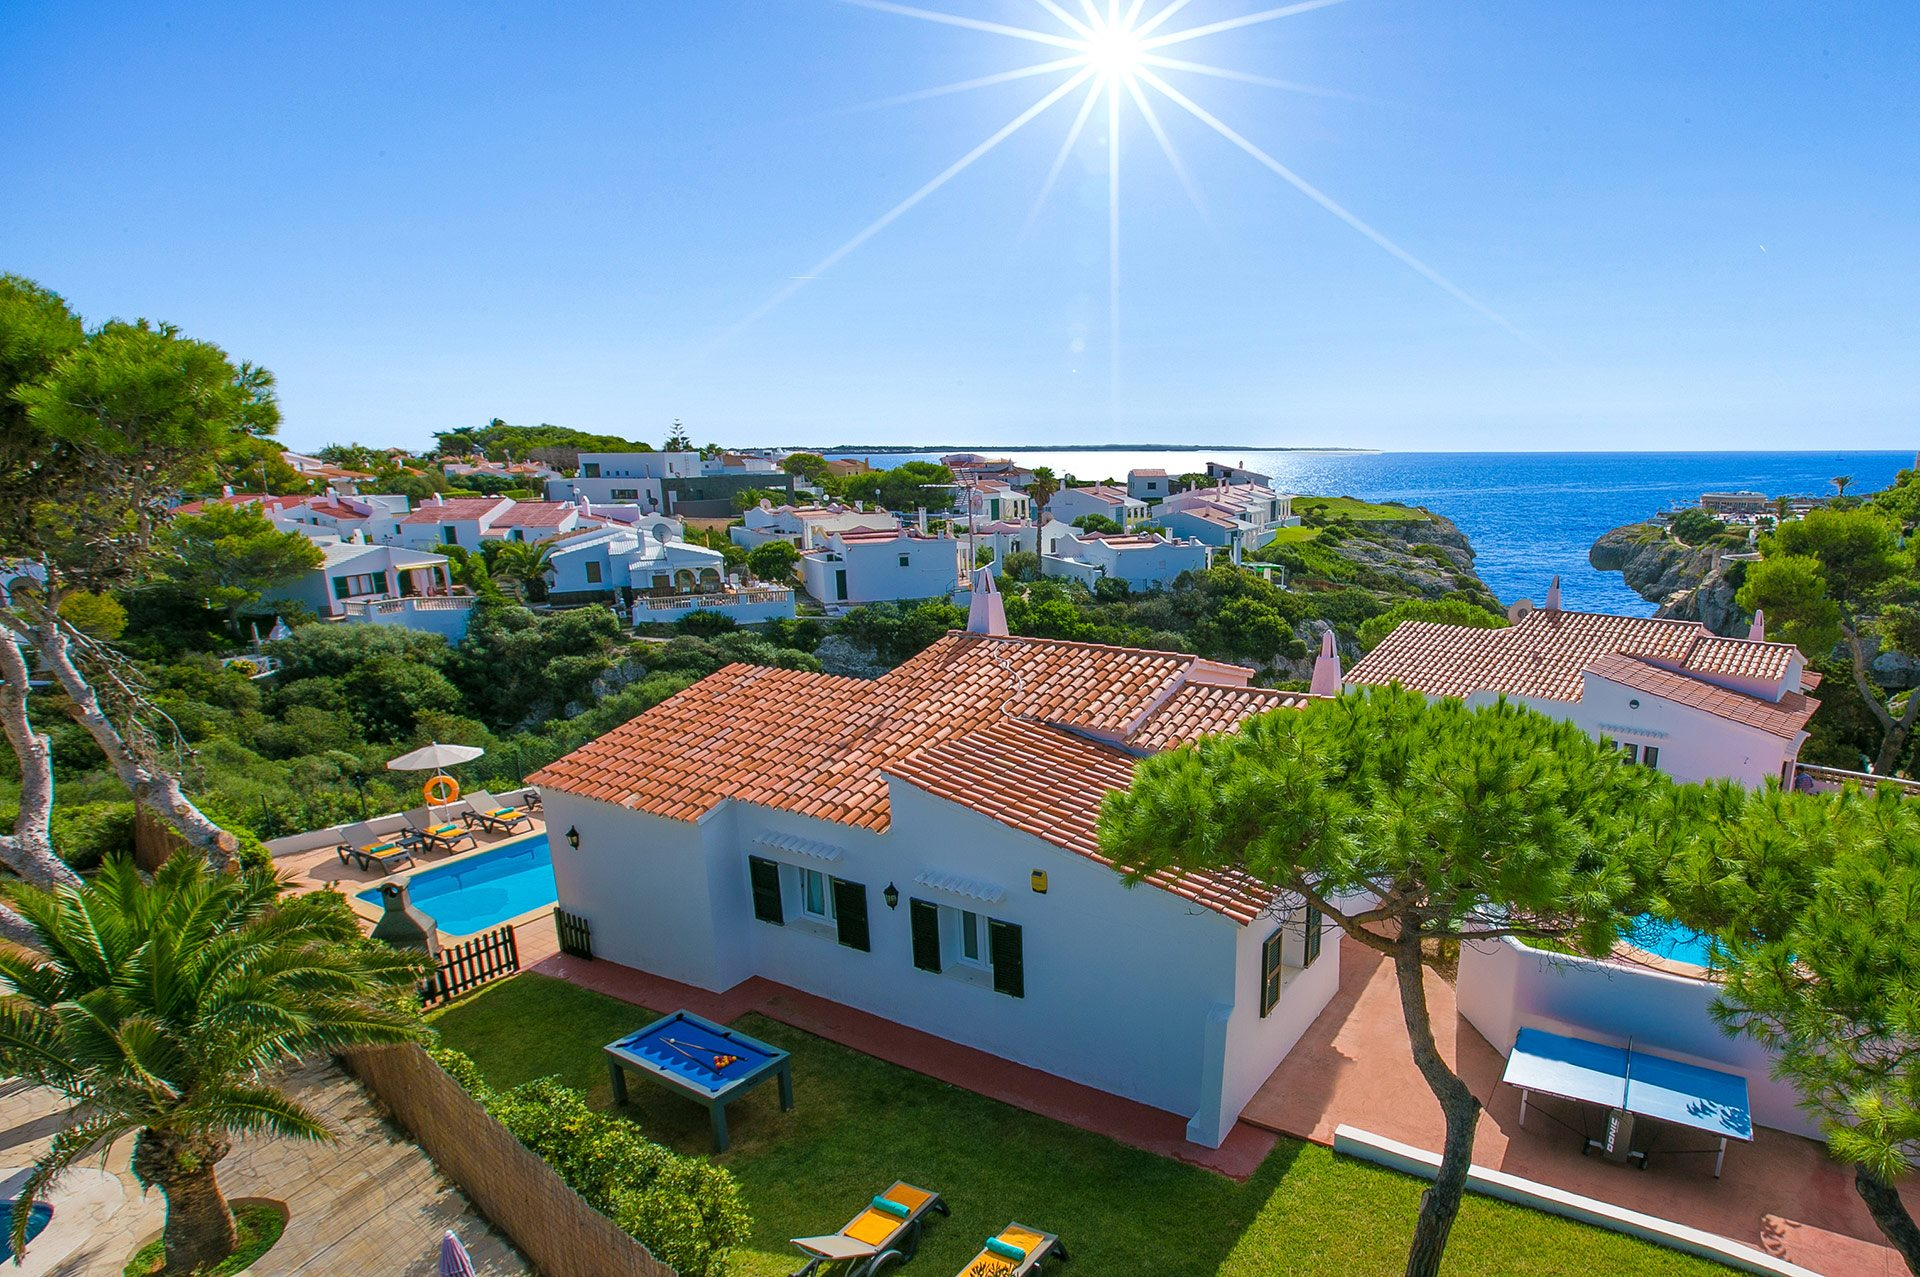 Villa Nereida, Calan Forcat, Menorca, Spain